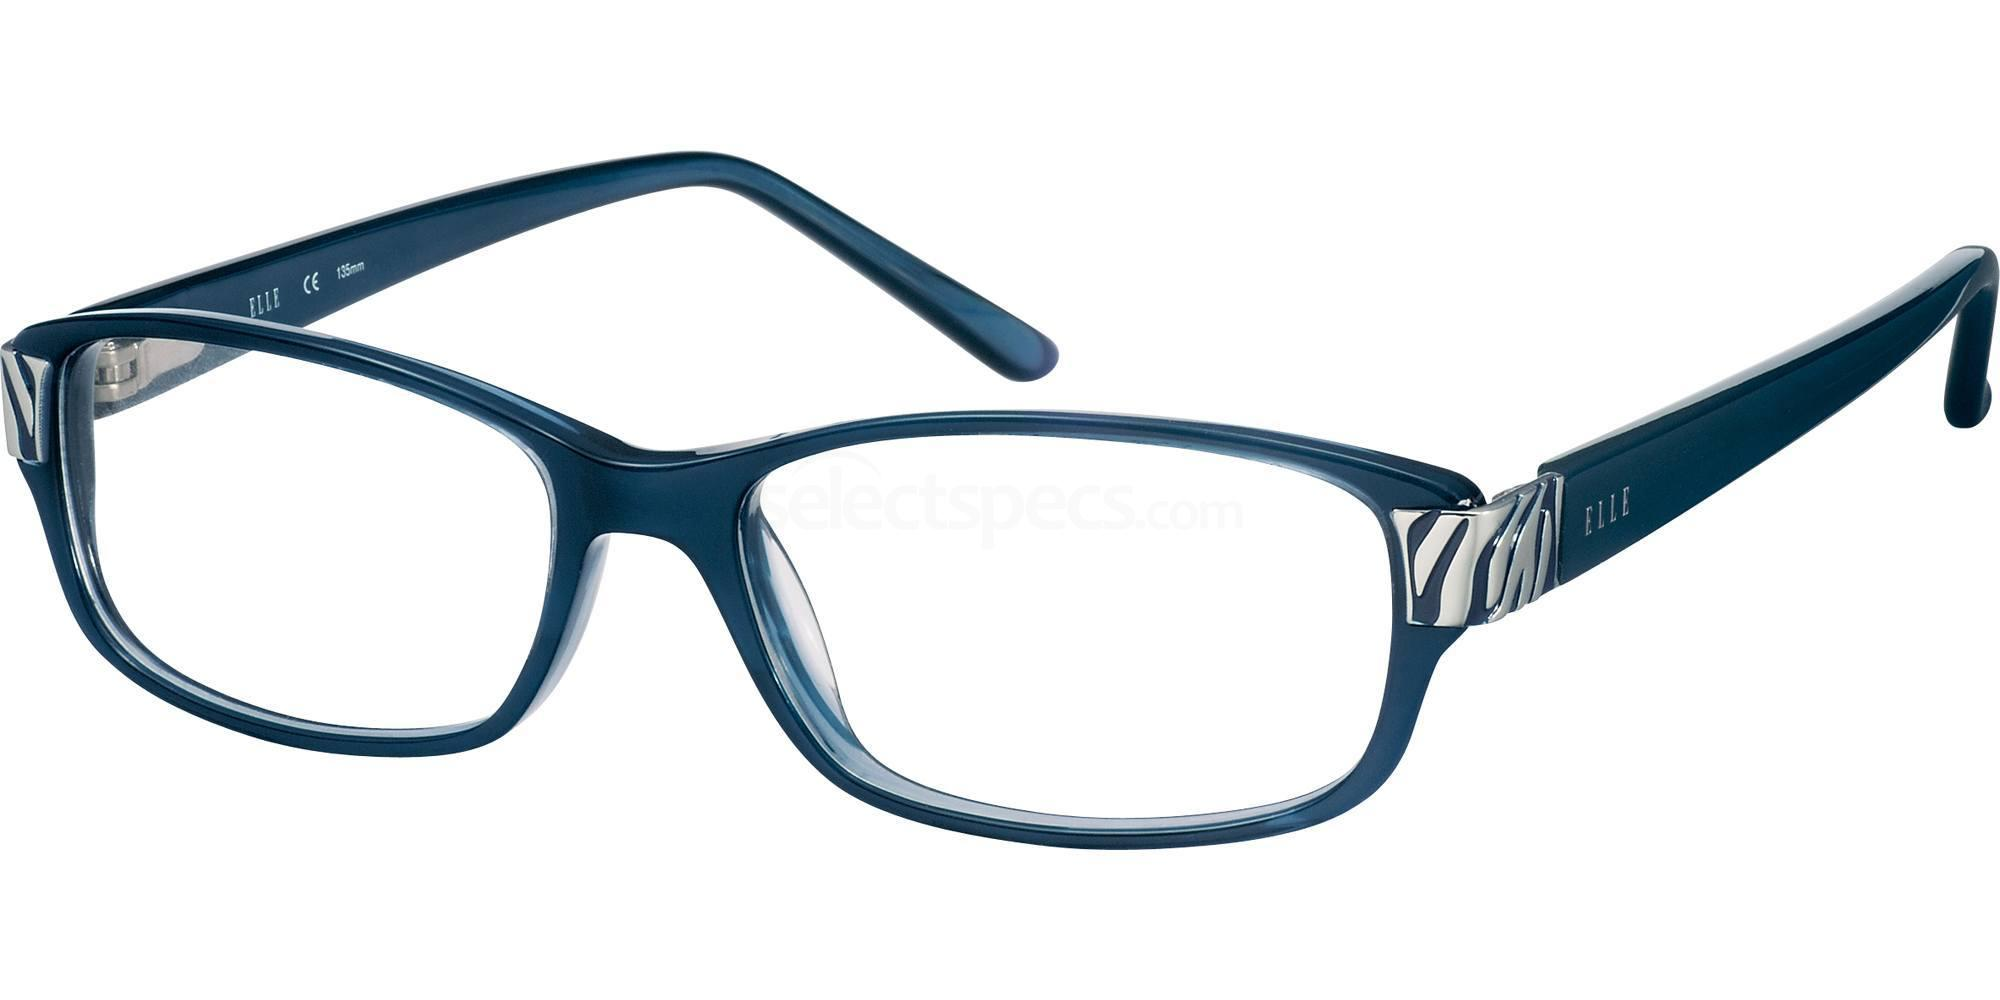 BL EL13383 Glasses, ELLE